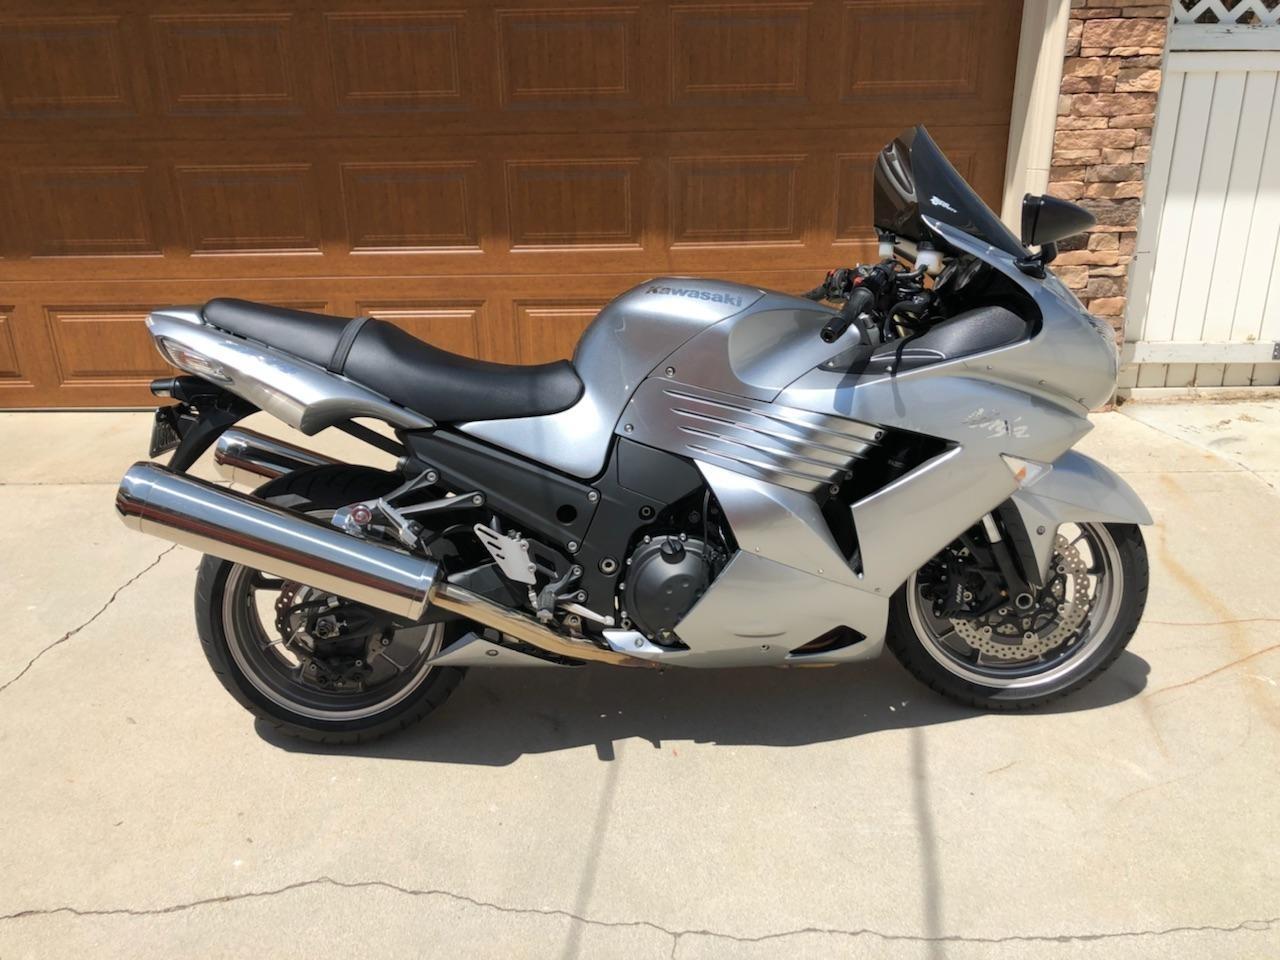 ZX10R For Sale - Kawasaki Motorcycle,528553,1049211046,1049212410